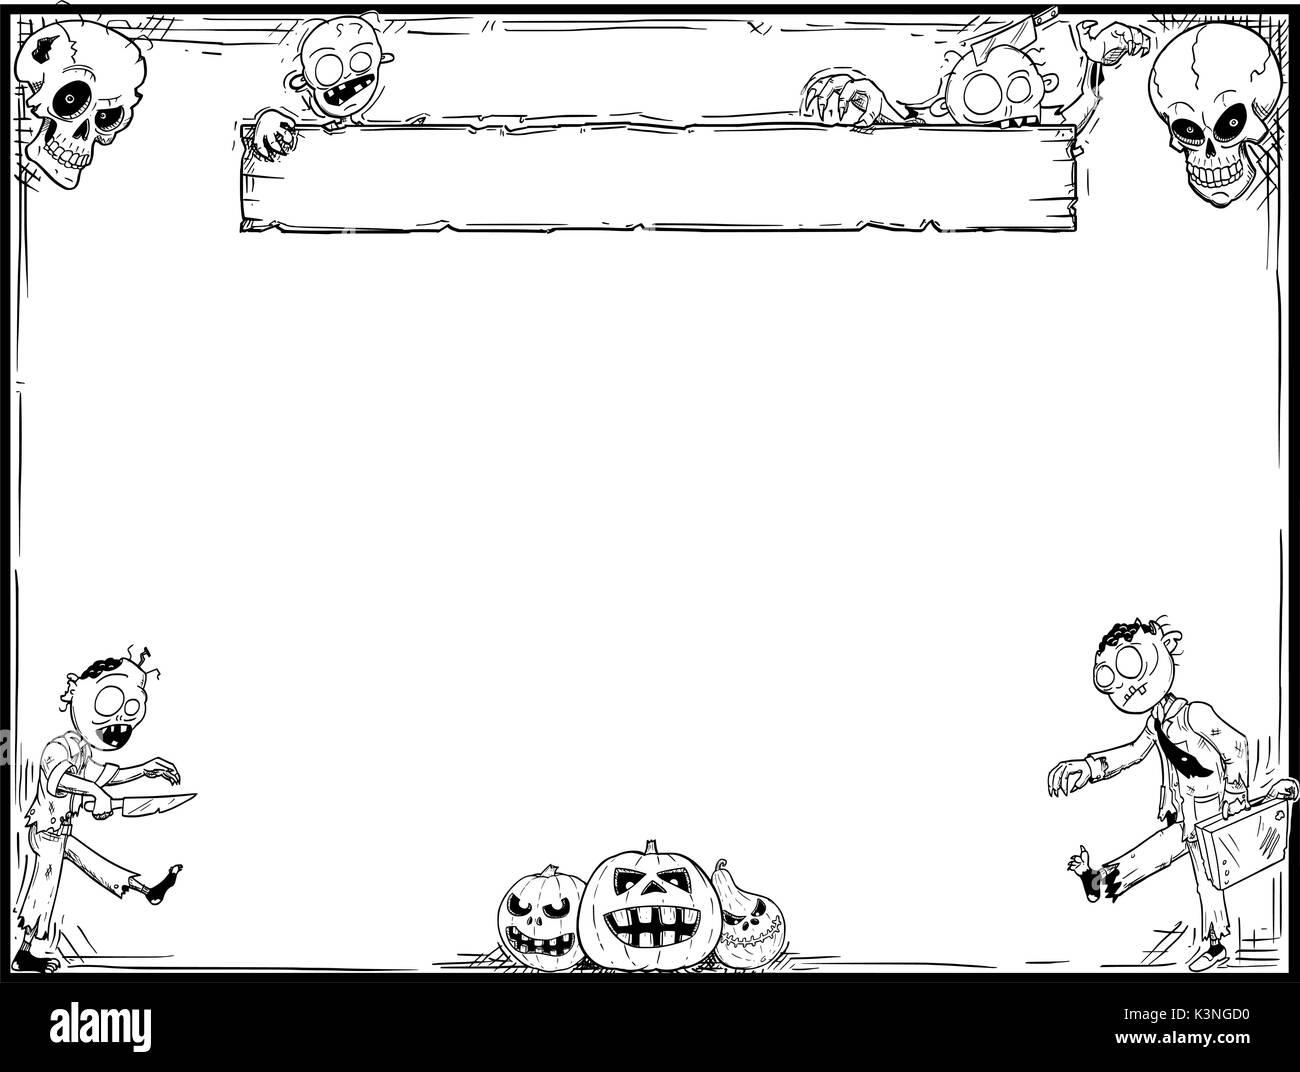 Dessin à La Main Cartoon Halloween Cadre Avec Zombie Mignon